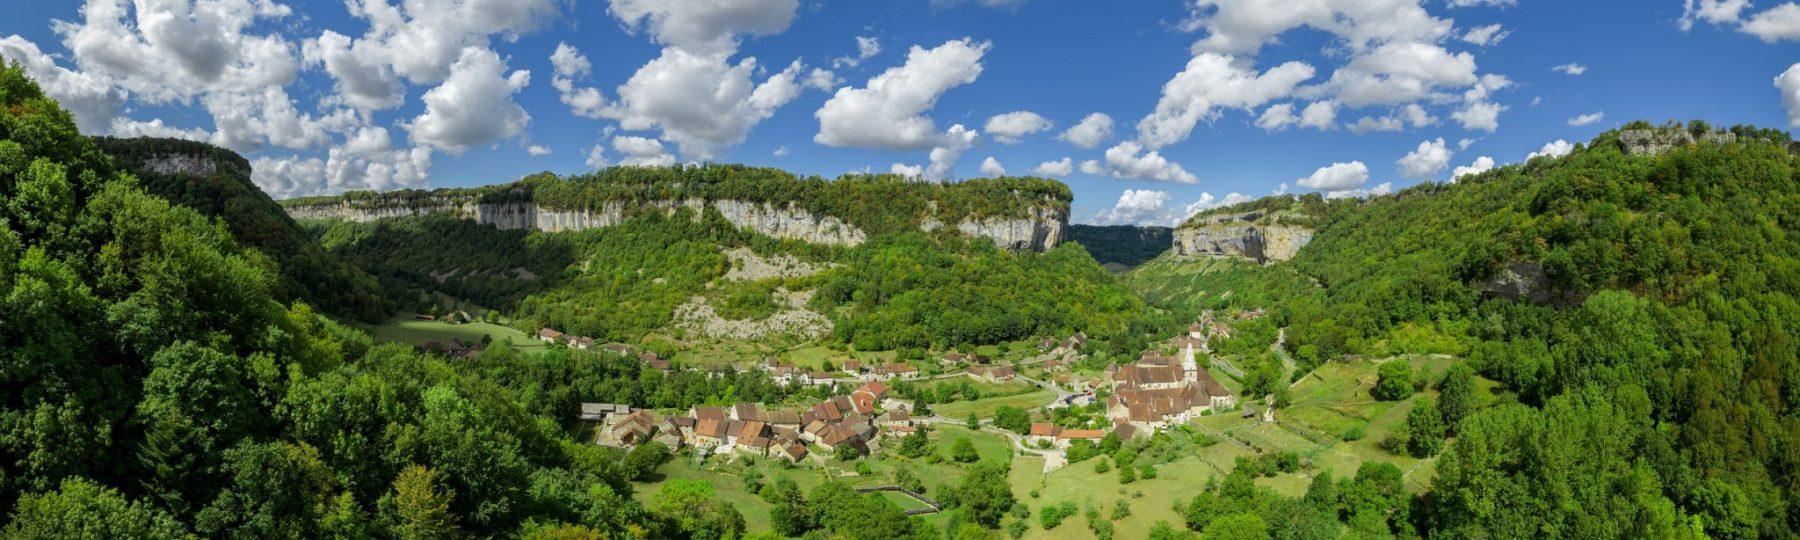 Baume-les-Messieurs  © Stéphane Godin/Jura Tourisme